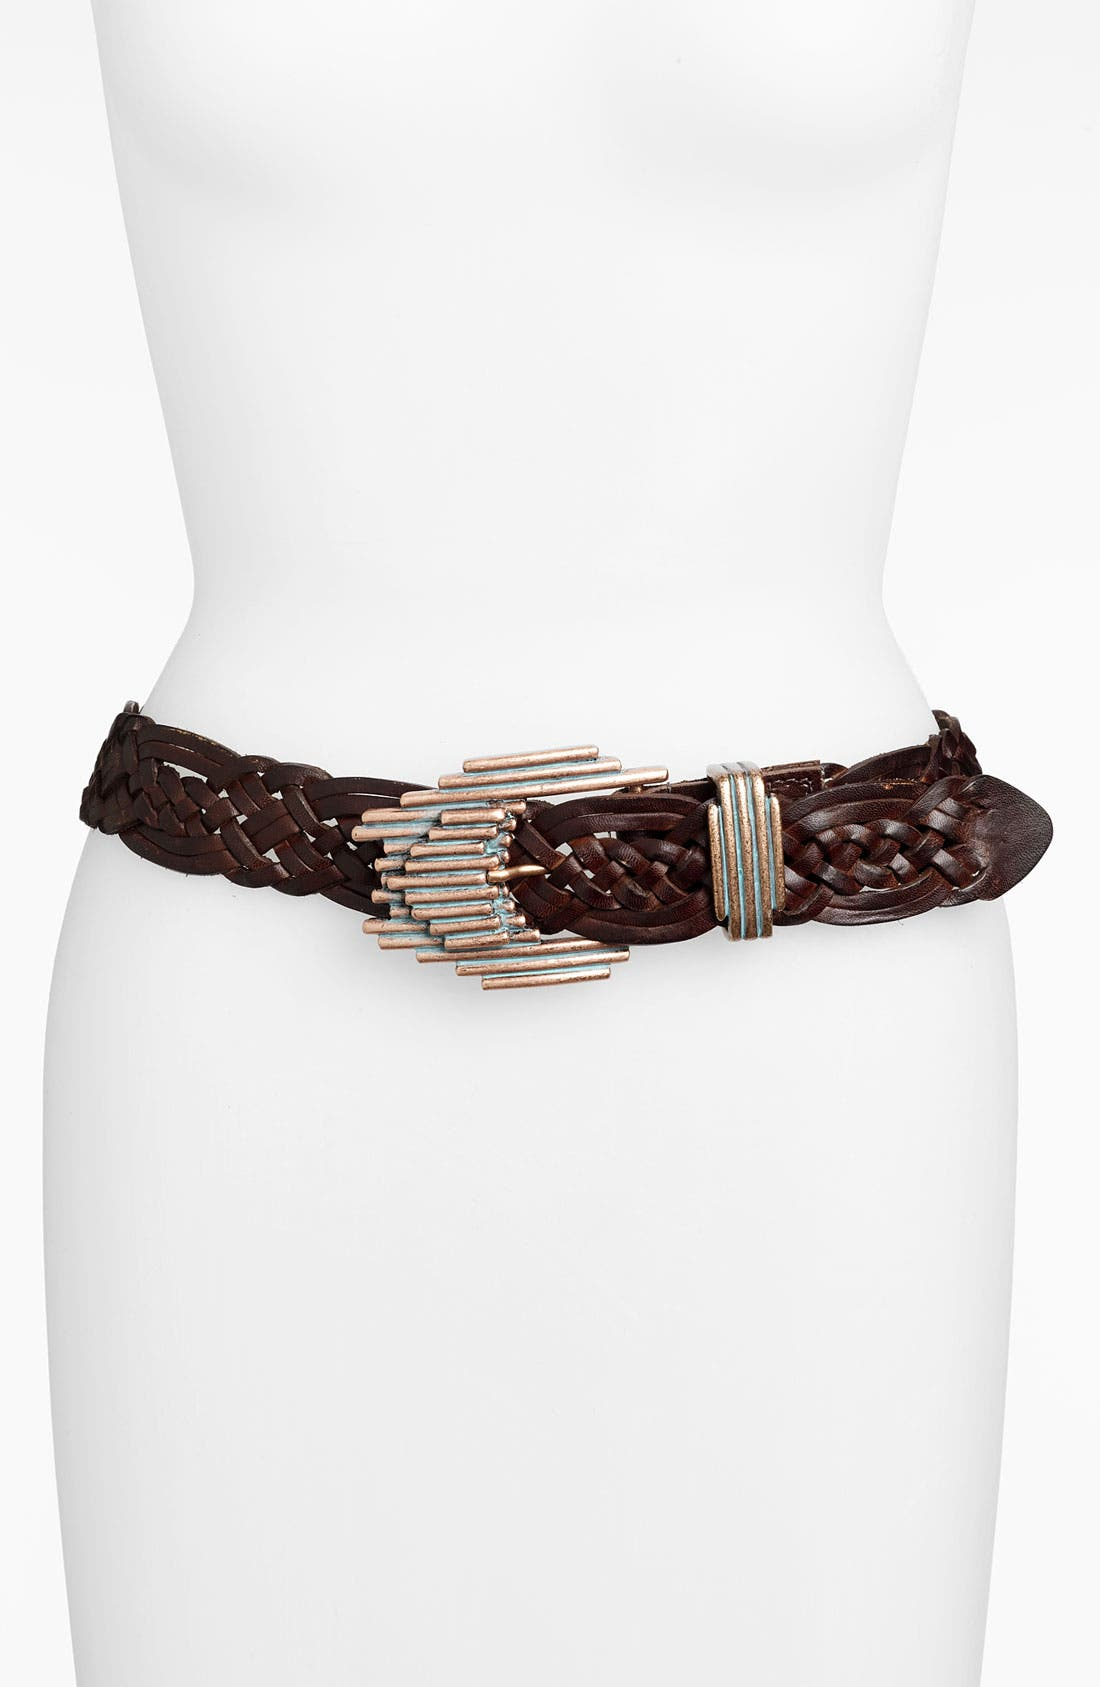 Main Image - Leatherock 'Deco' Woven Belt